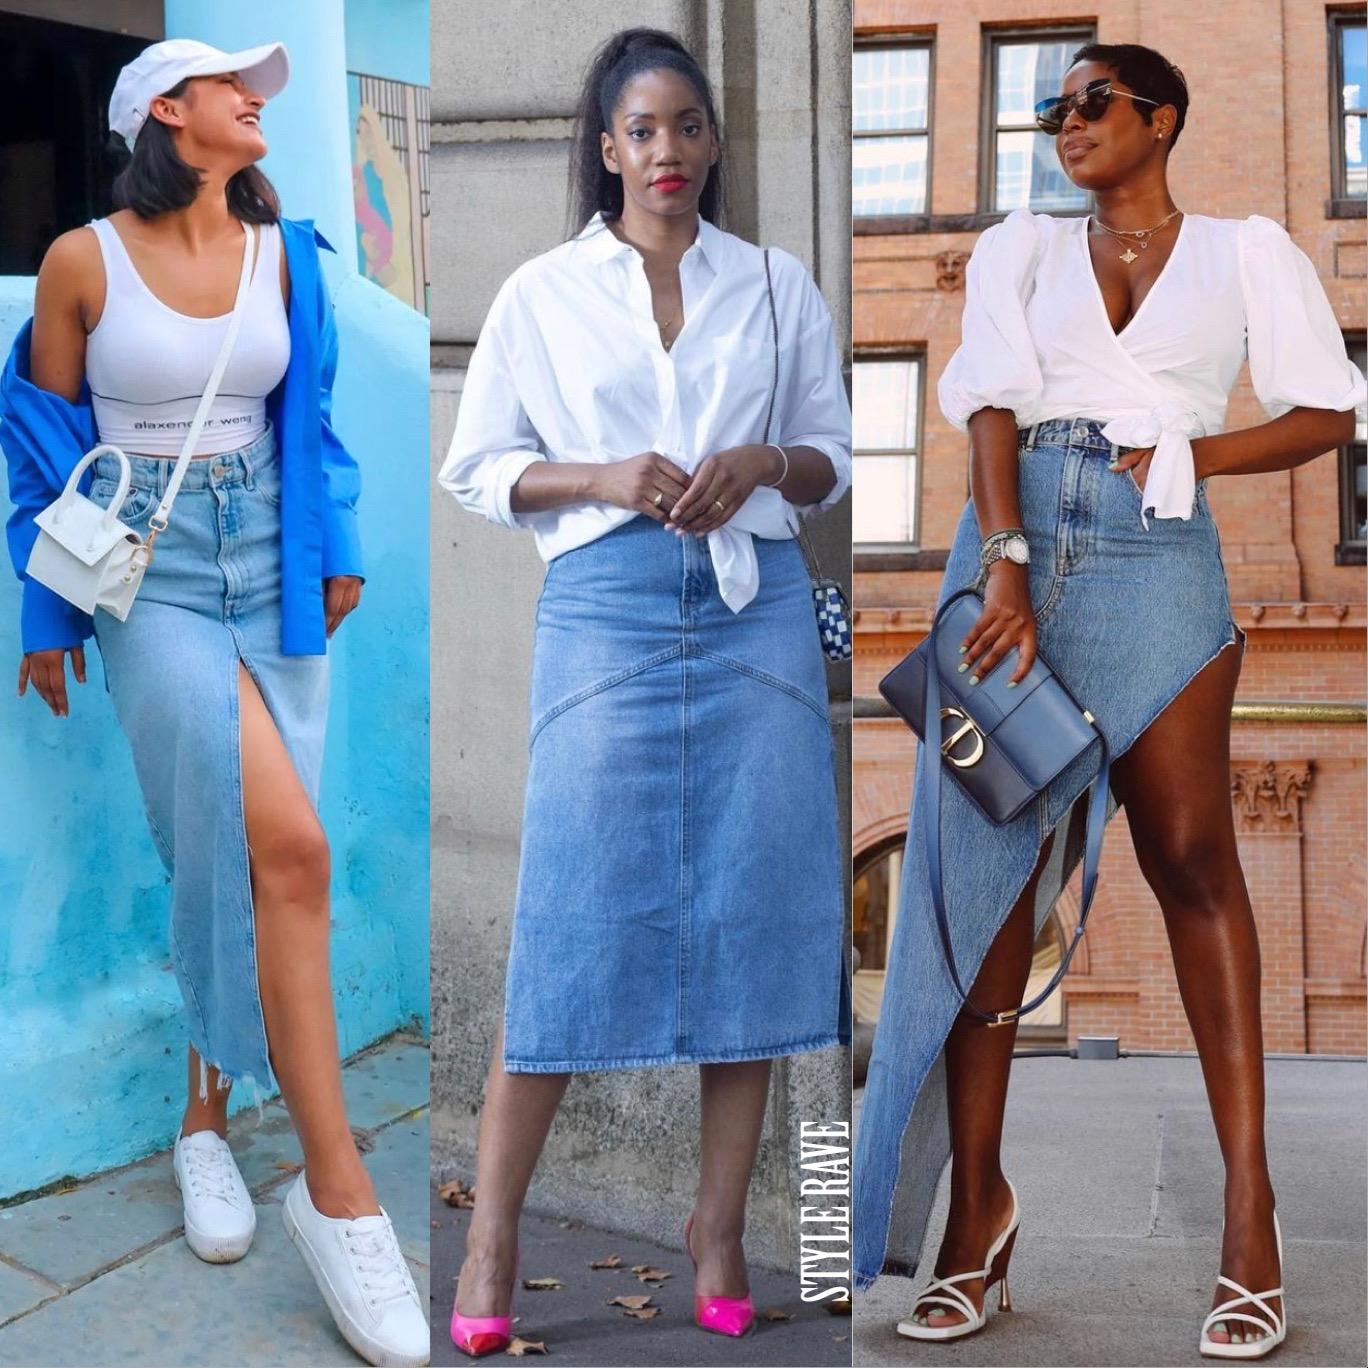 3-black-women-influencers-show-denim-skirts-for-women